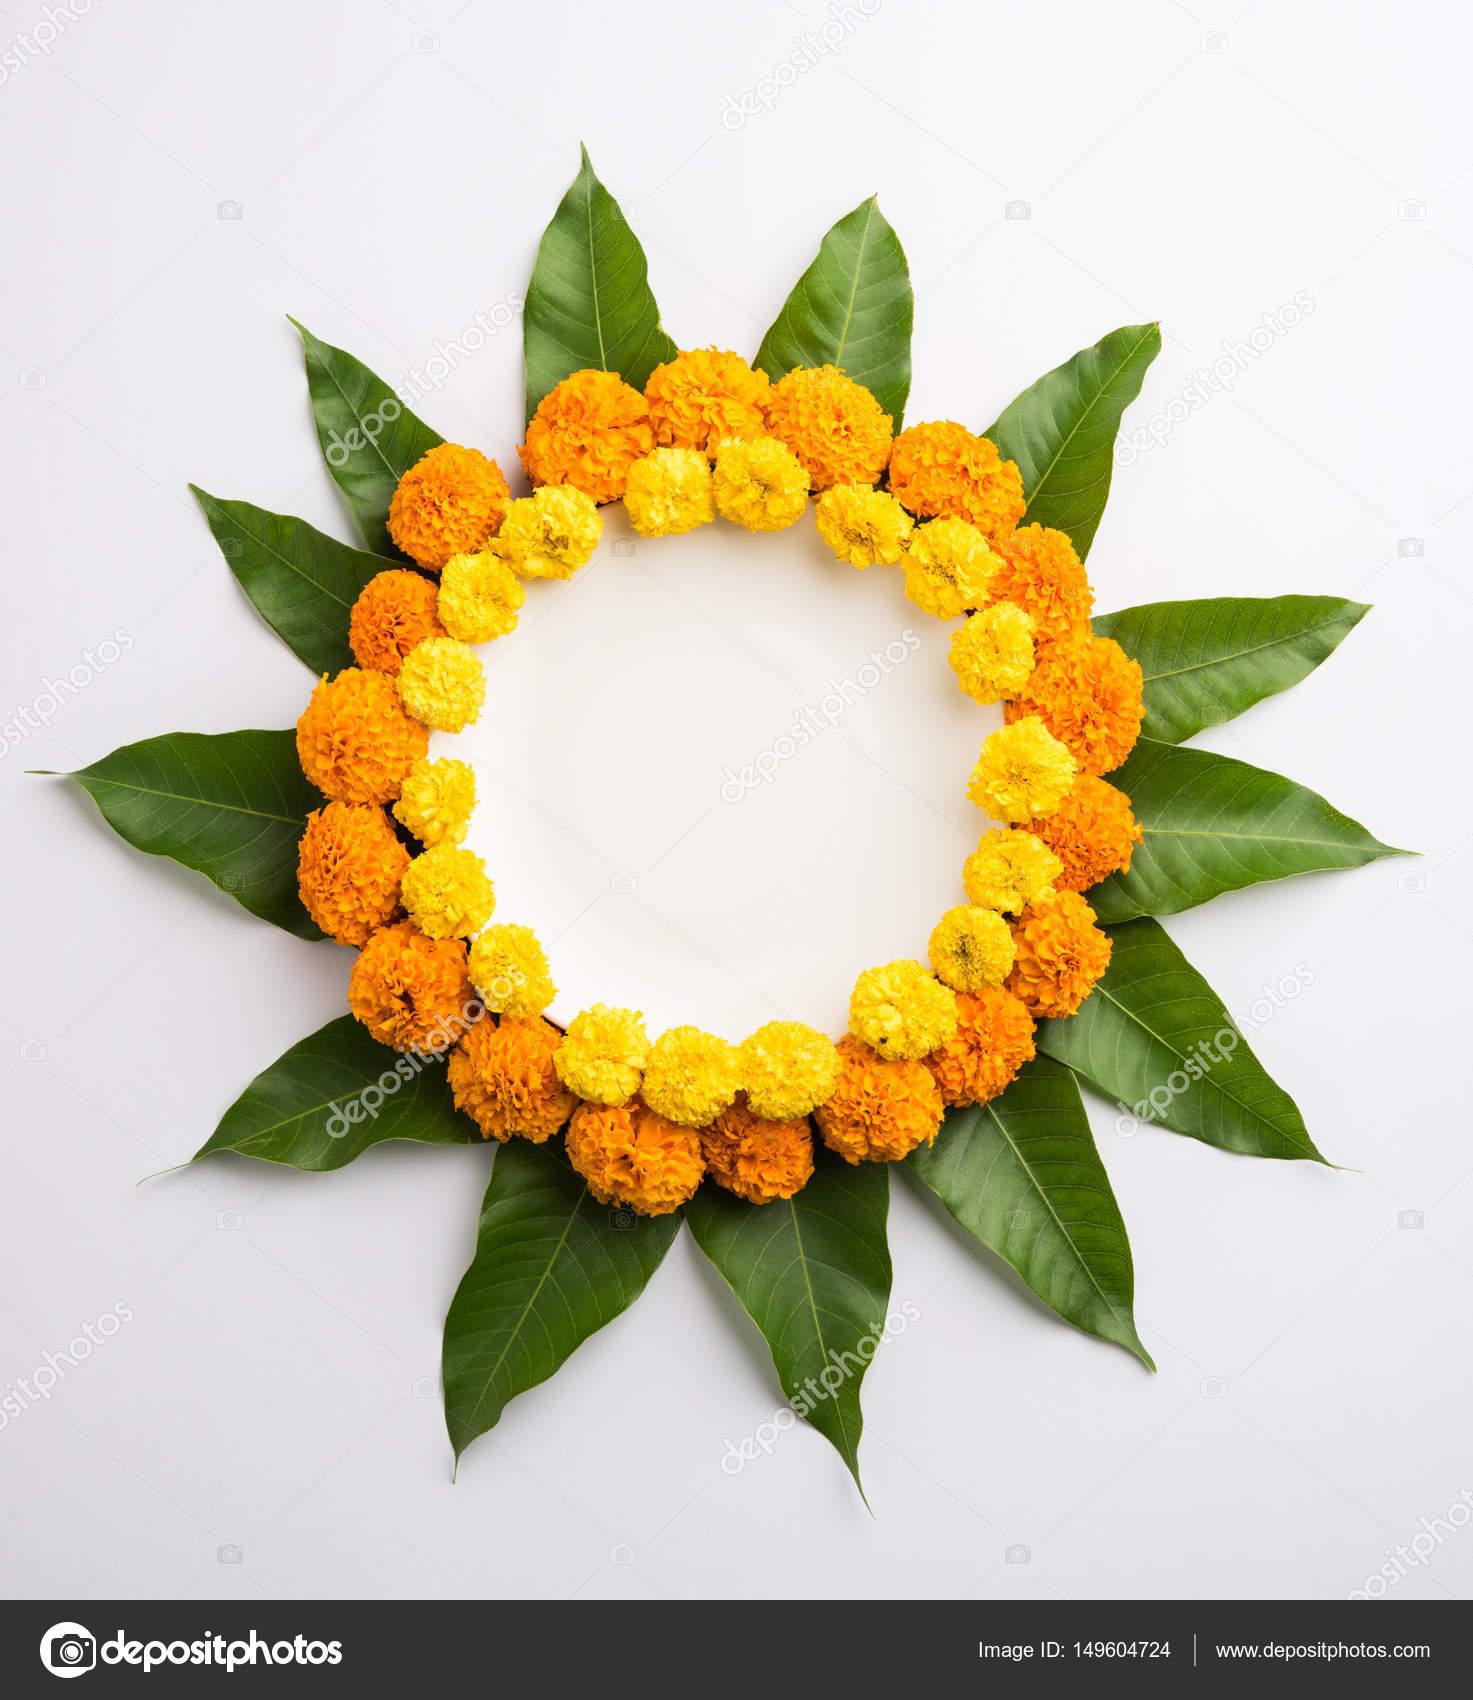 Flower Rangoli Made Using Marigold Or Zendu Flowers And Mango Leaves Over Black Background With Copy